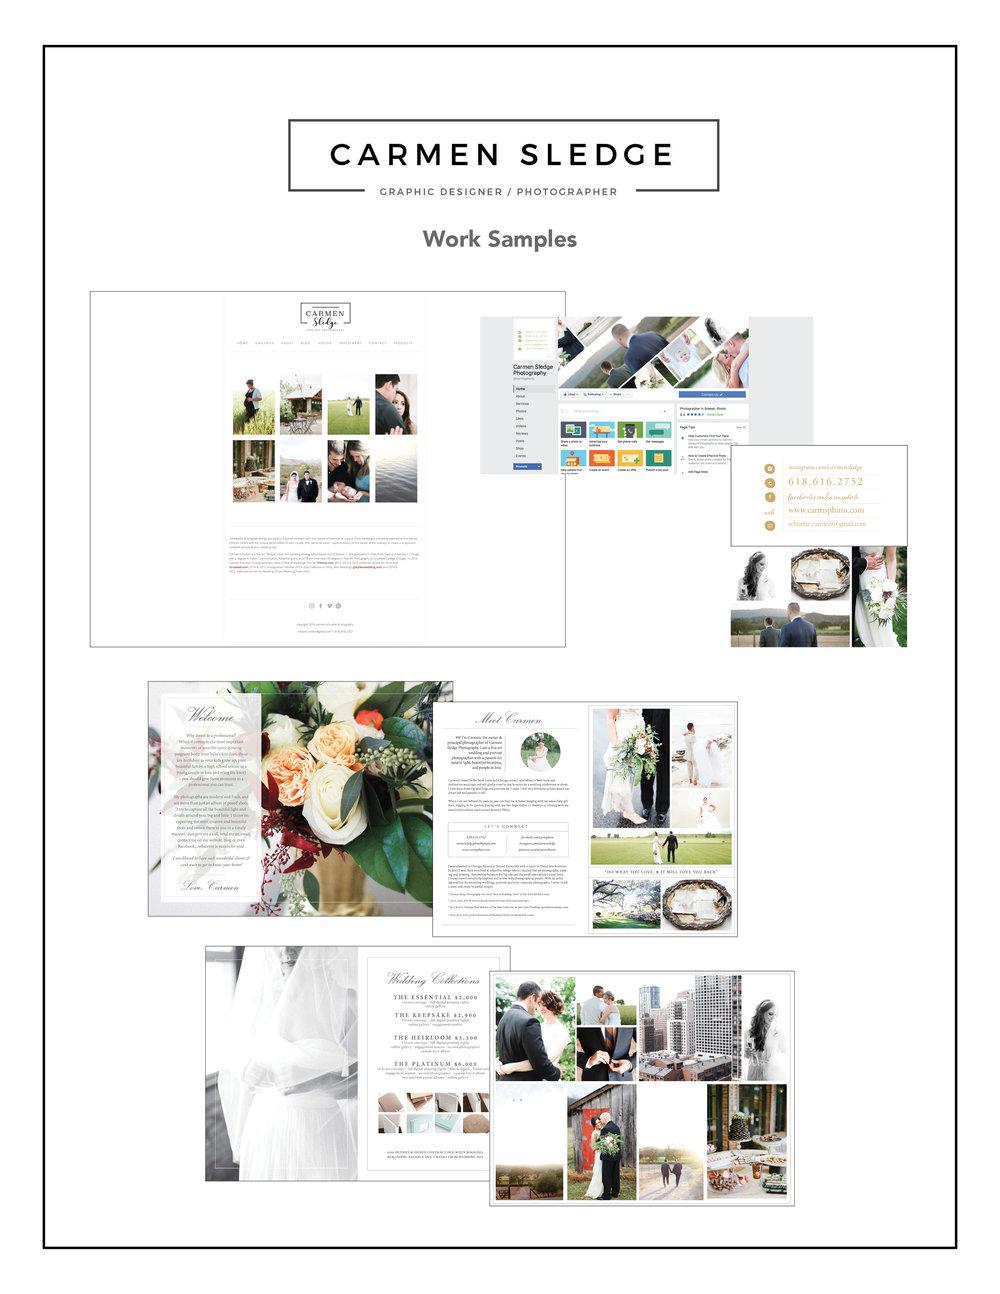 Work Samples2.jpg